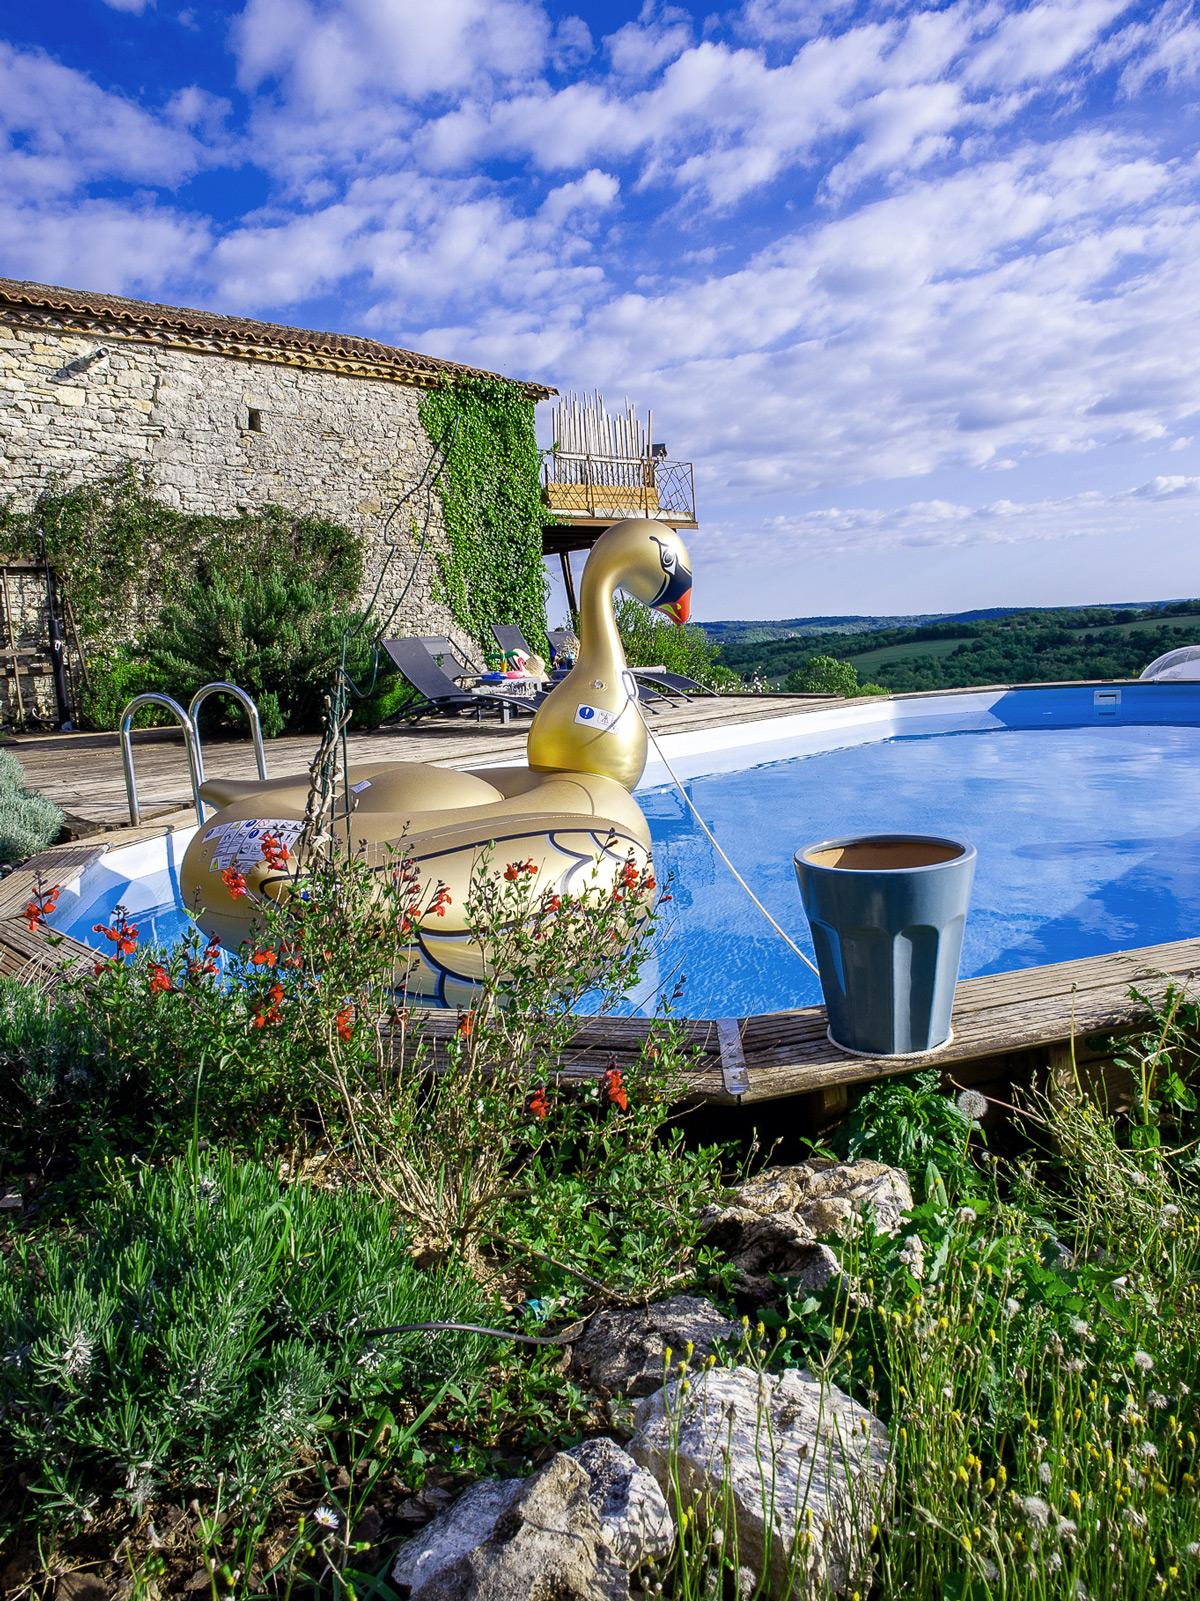 https://www.noct-enbulle.fr/wp-content/uploads/2019/05/bulle-location-amoureux-lot-noct-enbulle-hotel.jpg